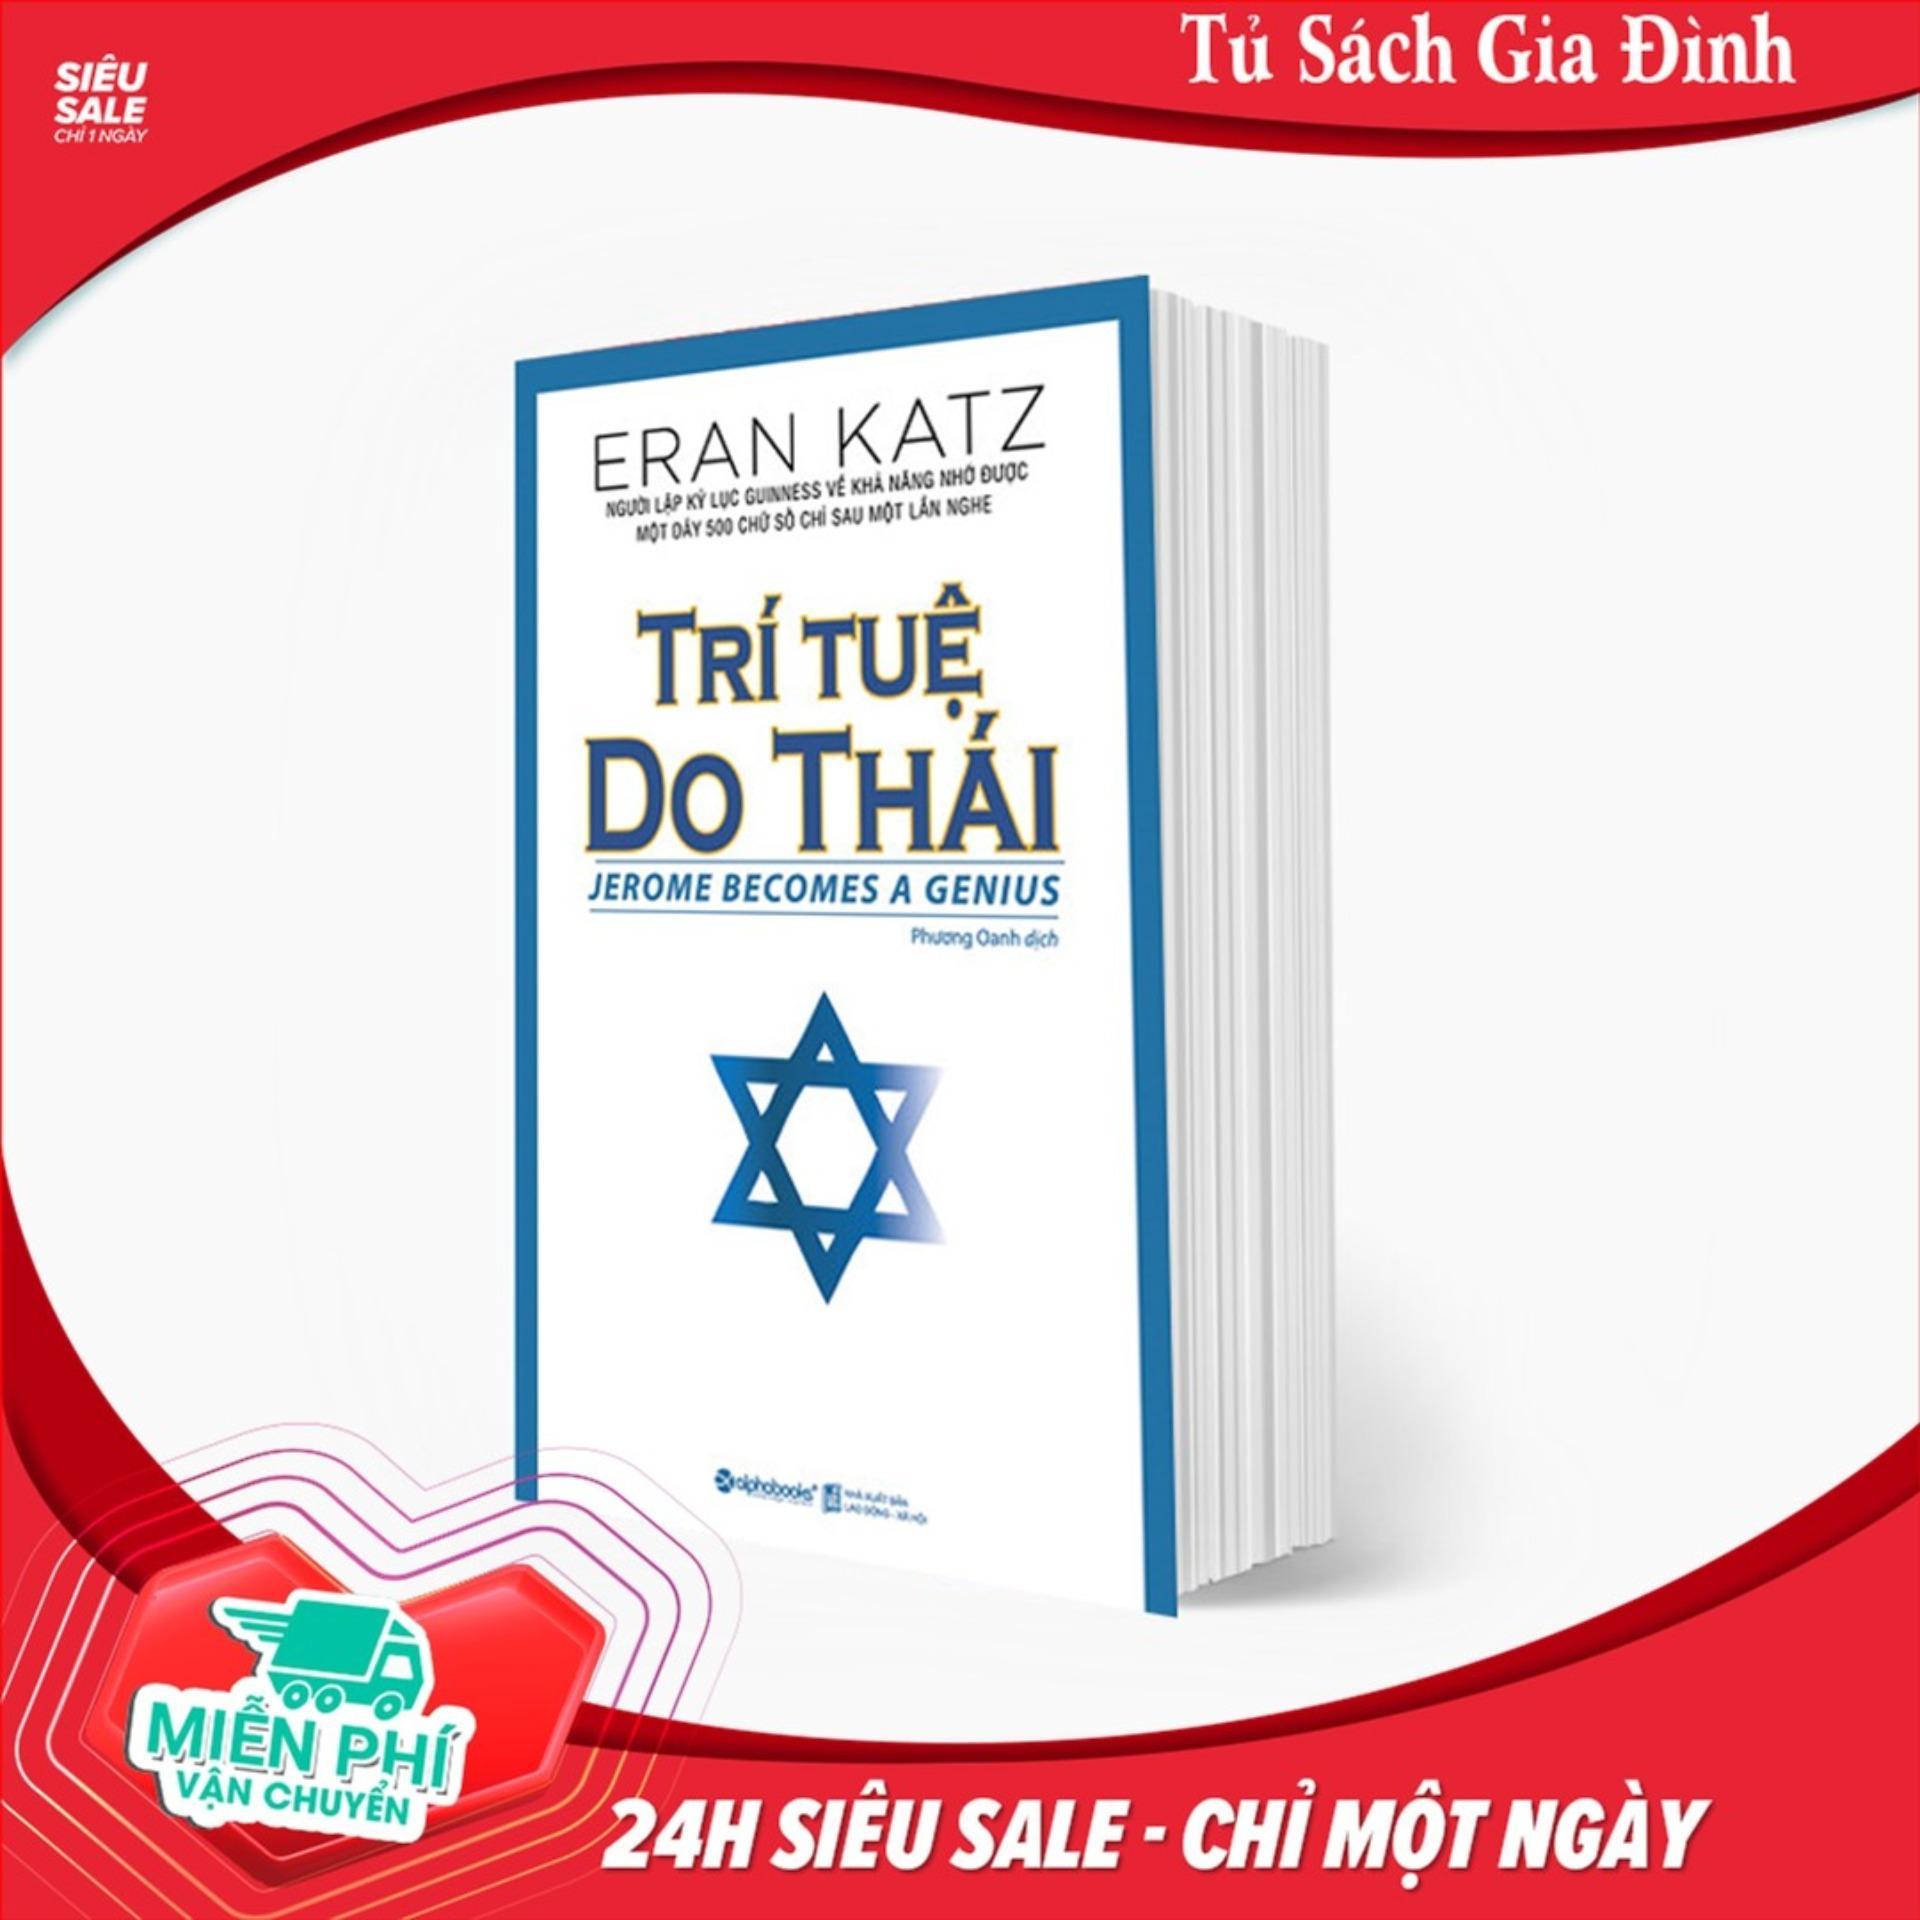 Trí Tuệ Do Thái - Tặng Bookmark Kẹp Sách